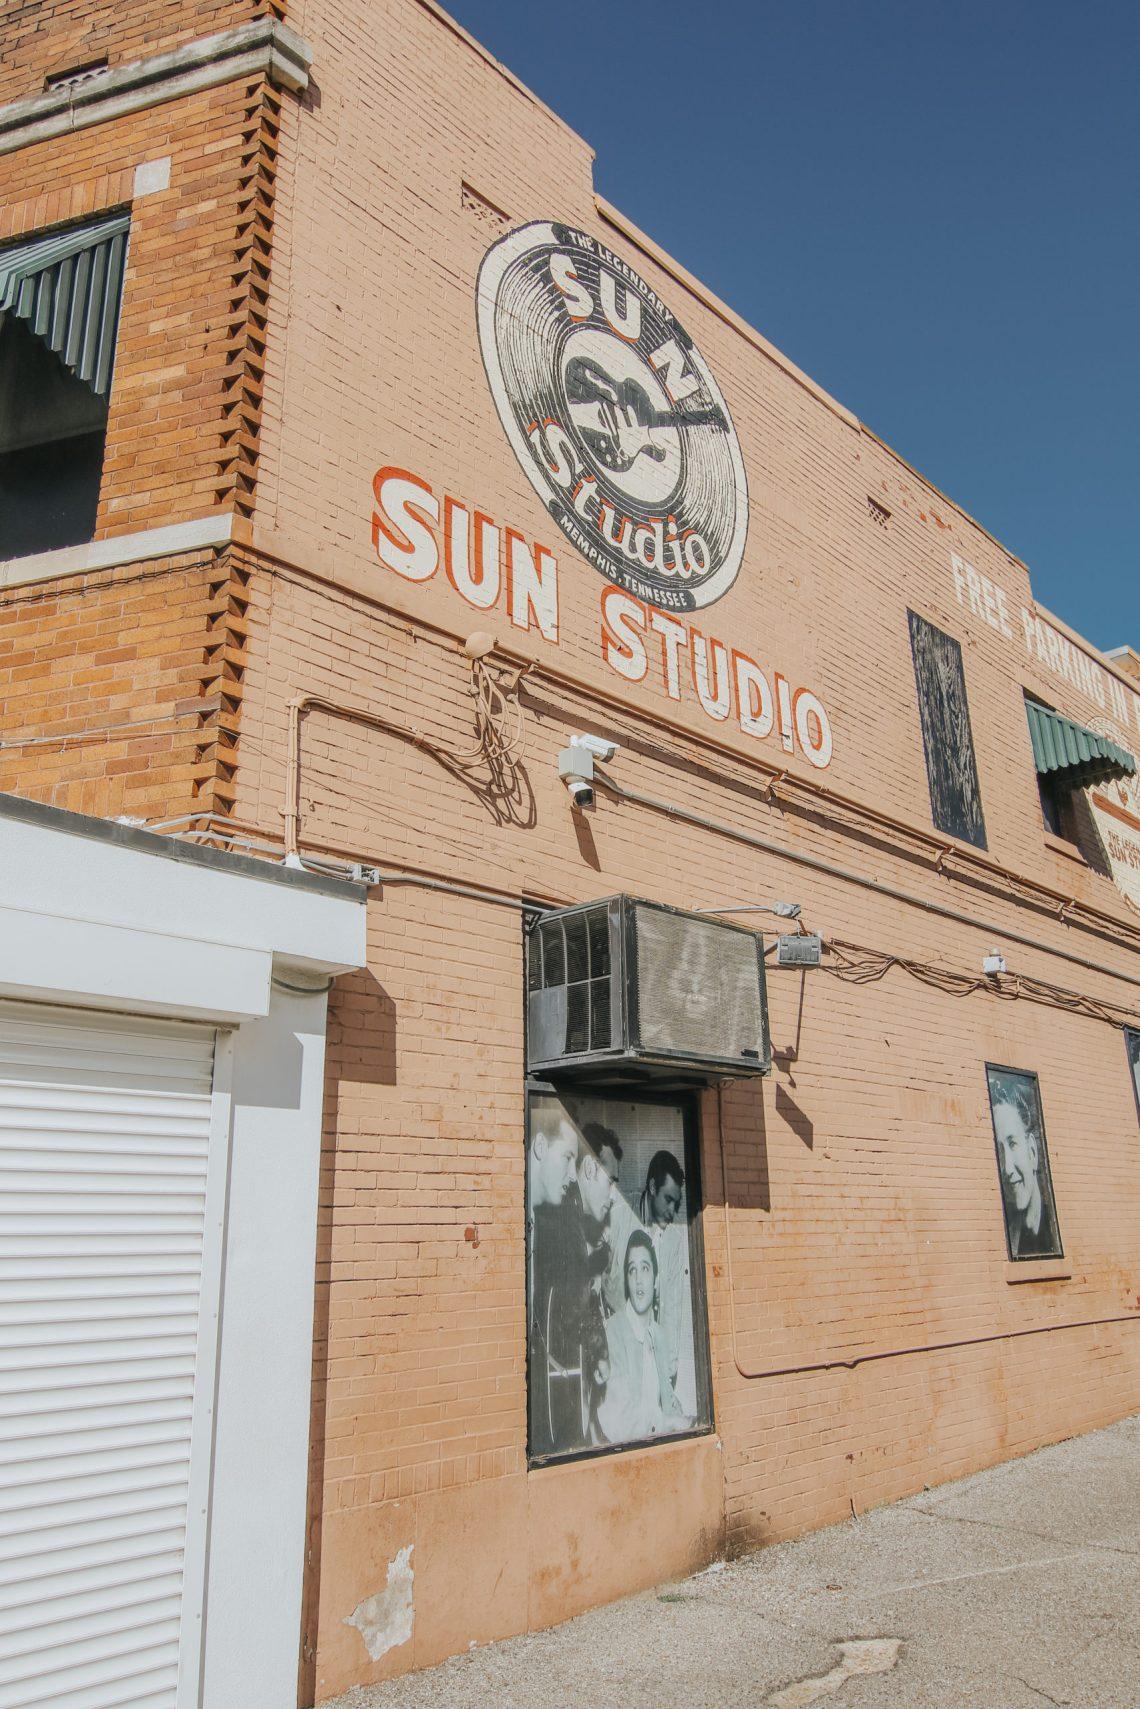 Sun Studio, Memphis, Tennessee, Memphis Travel Guide, travel guide, The Best Instagram Spots in Memphis, travel, The Urban Darling, fashion, boho fashion, bohemian.